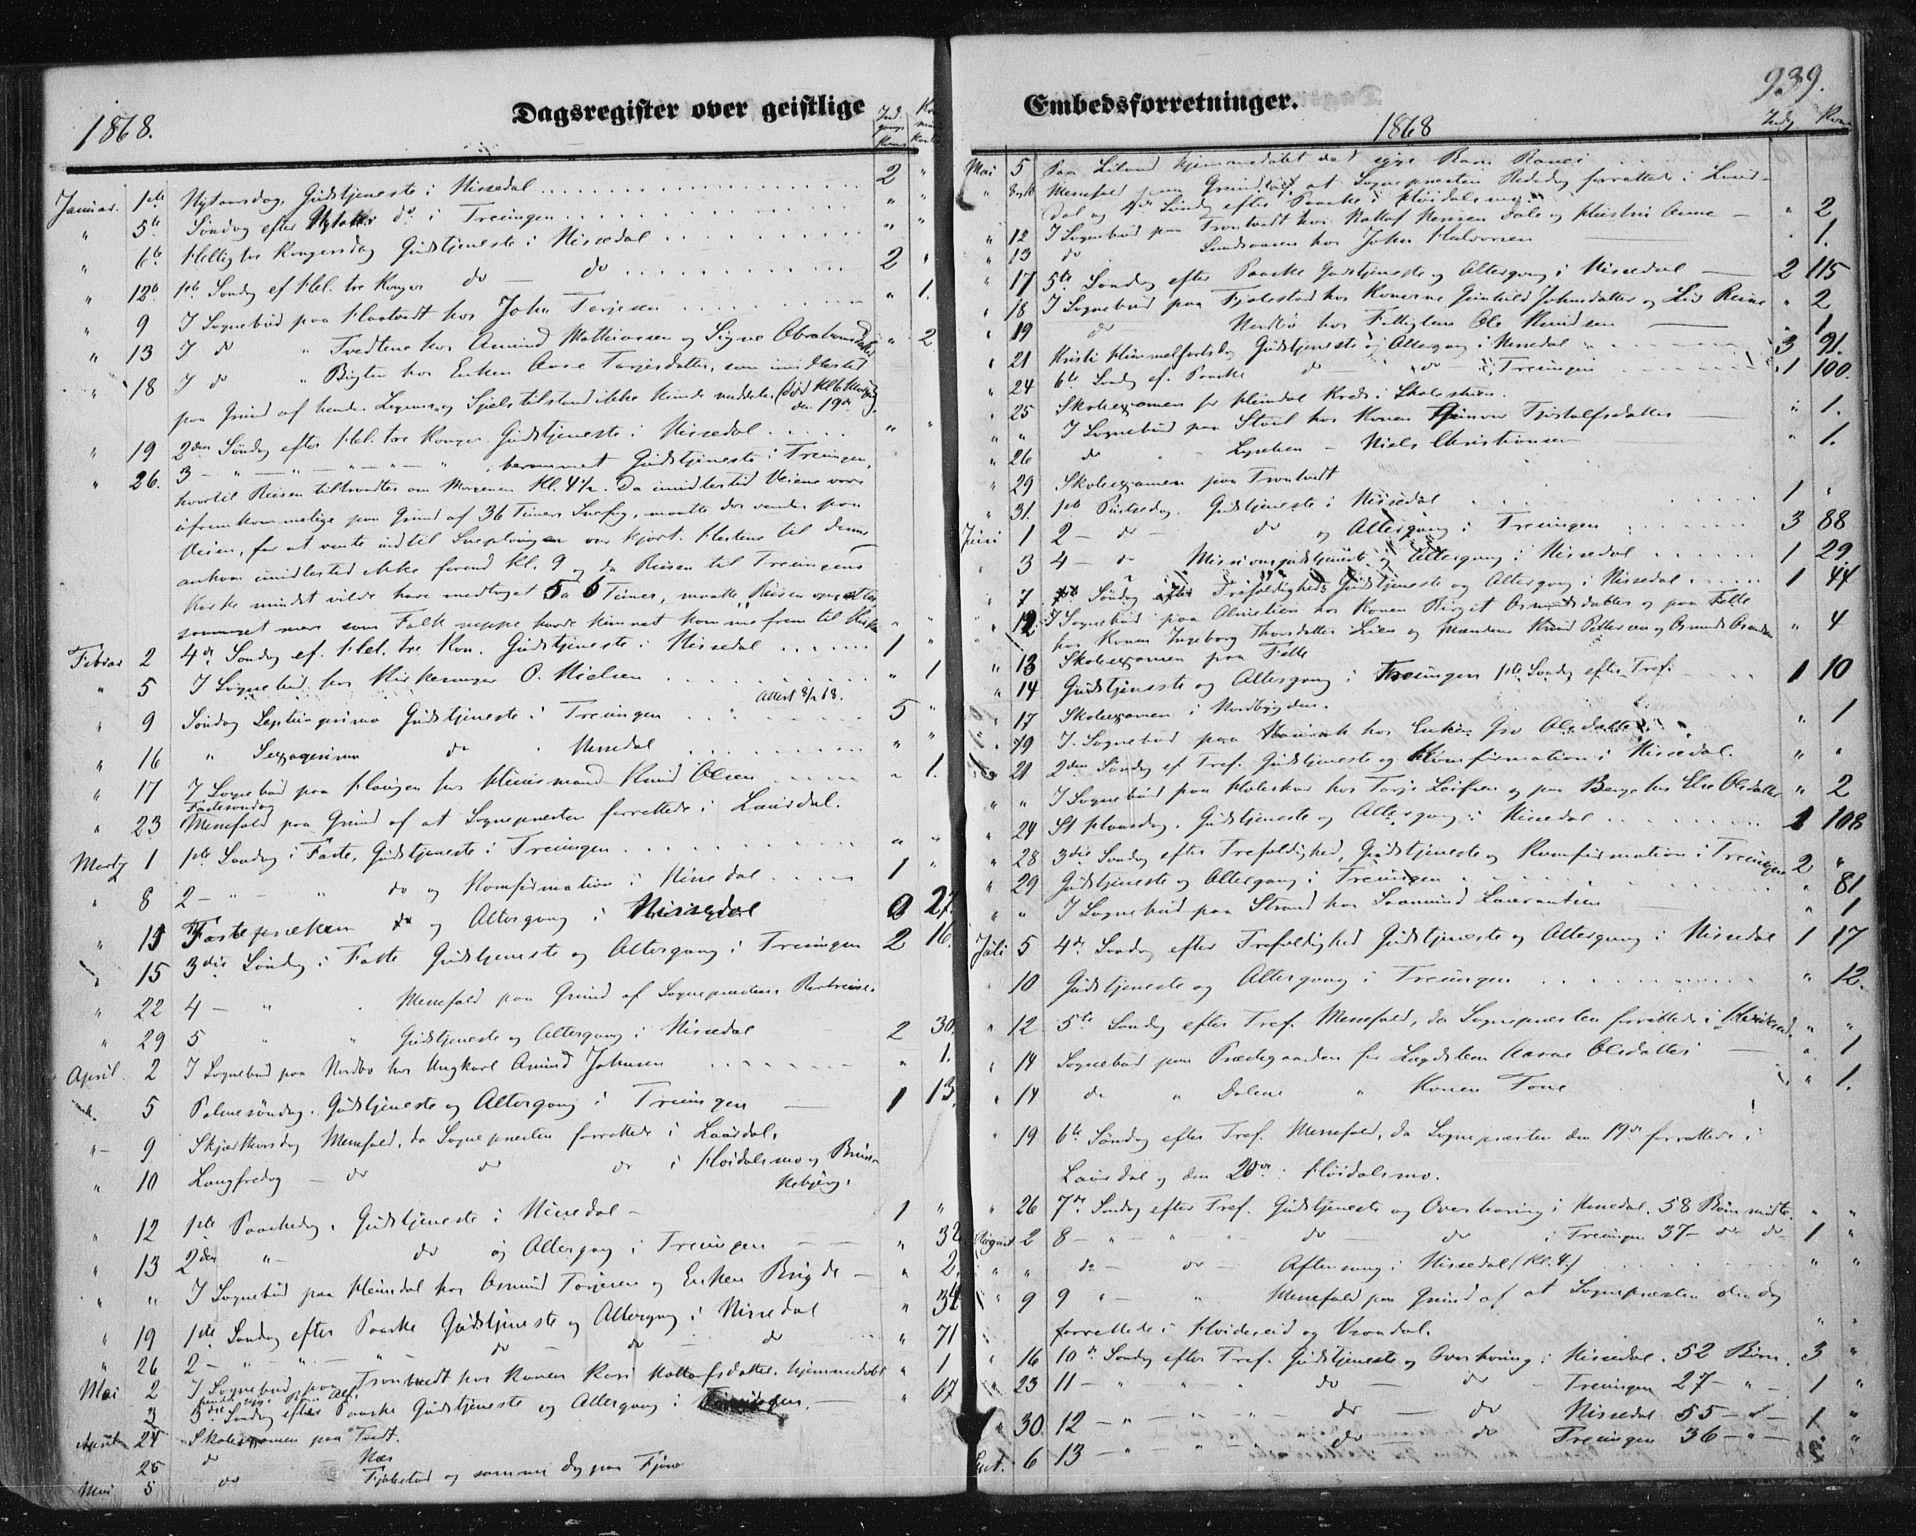 SAKO, Nissedal kirkebøker, F/Fa/L0003: Ministerialbok nr. I 3, 1846-1870, s. 938-939